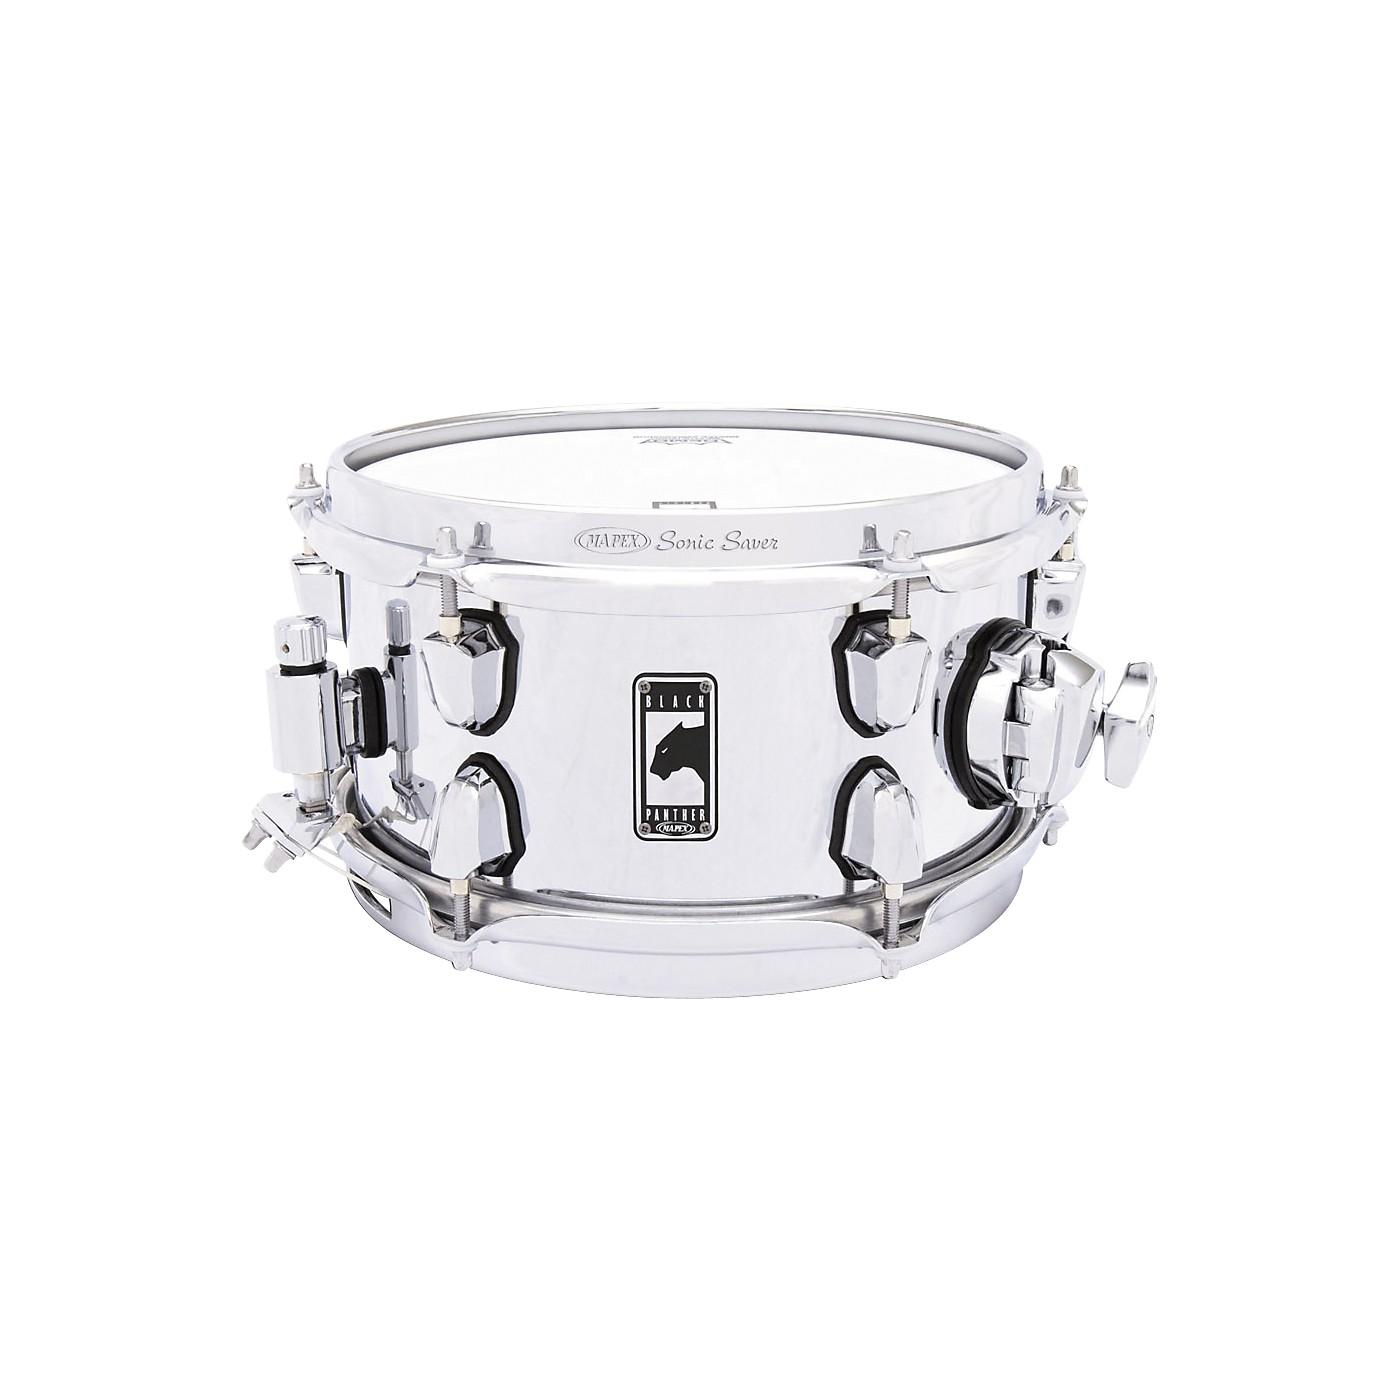 Mapex Black Panther Stinger Snare Drum thumbnail